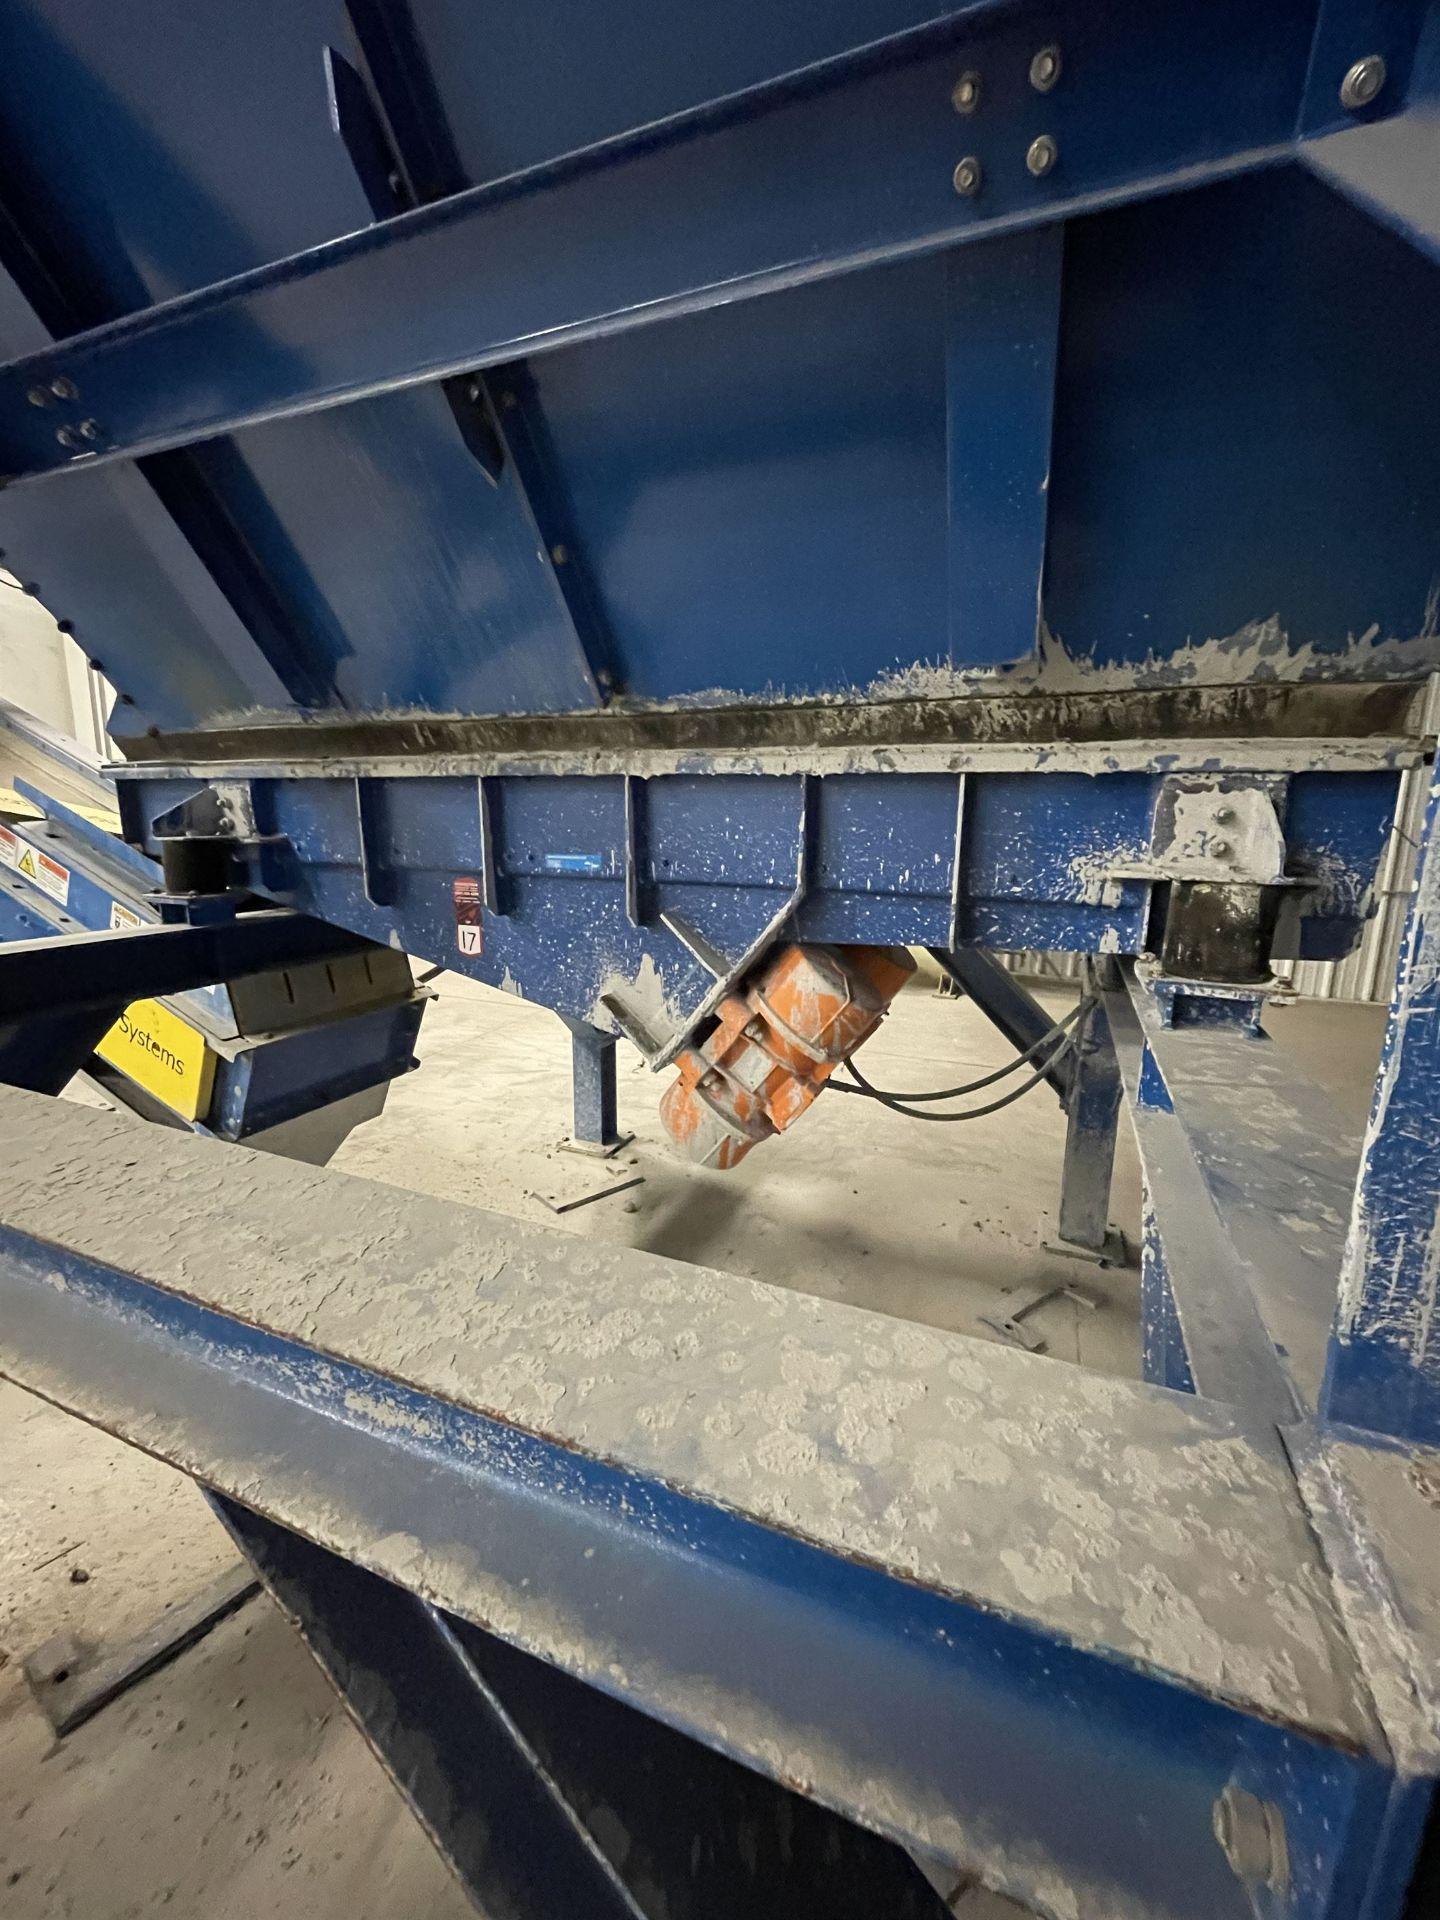 2015 SCREENING MACHINES HLOGO-60/300-25 Shaker Screen, s/n 1512A2186, 600 x 3000 x 250mm Trough, (2) - Image 2 of 12